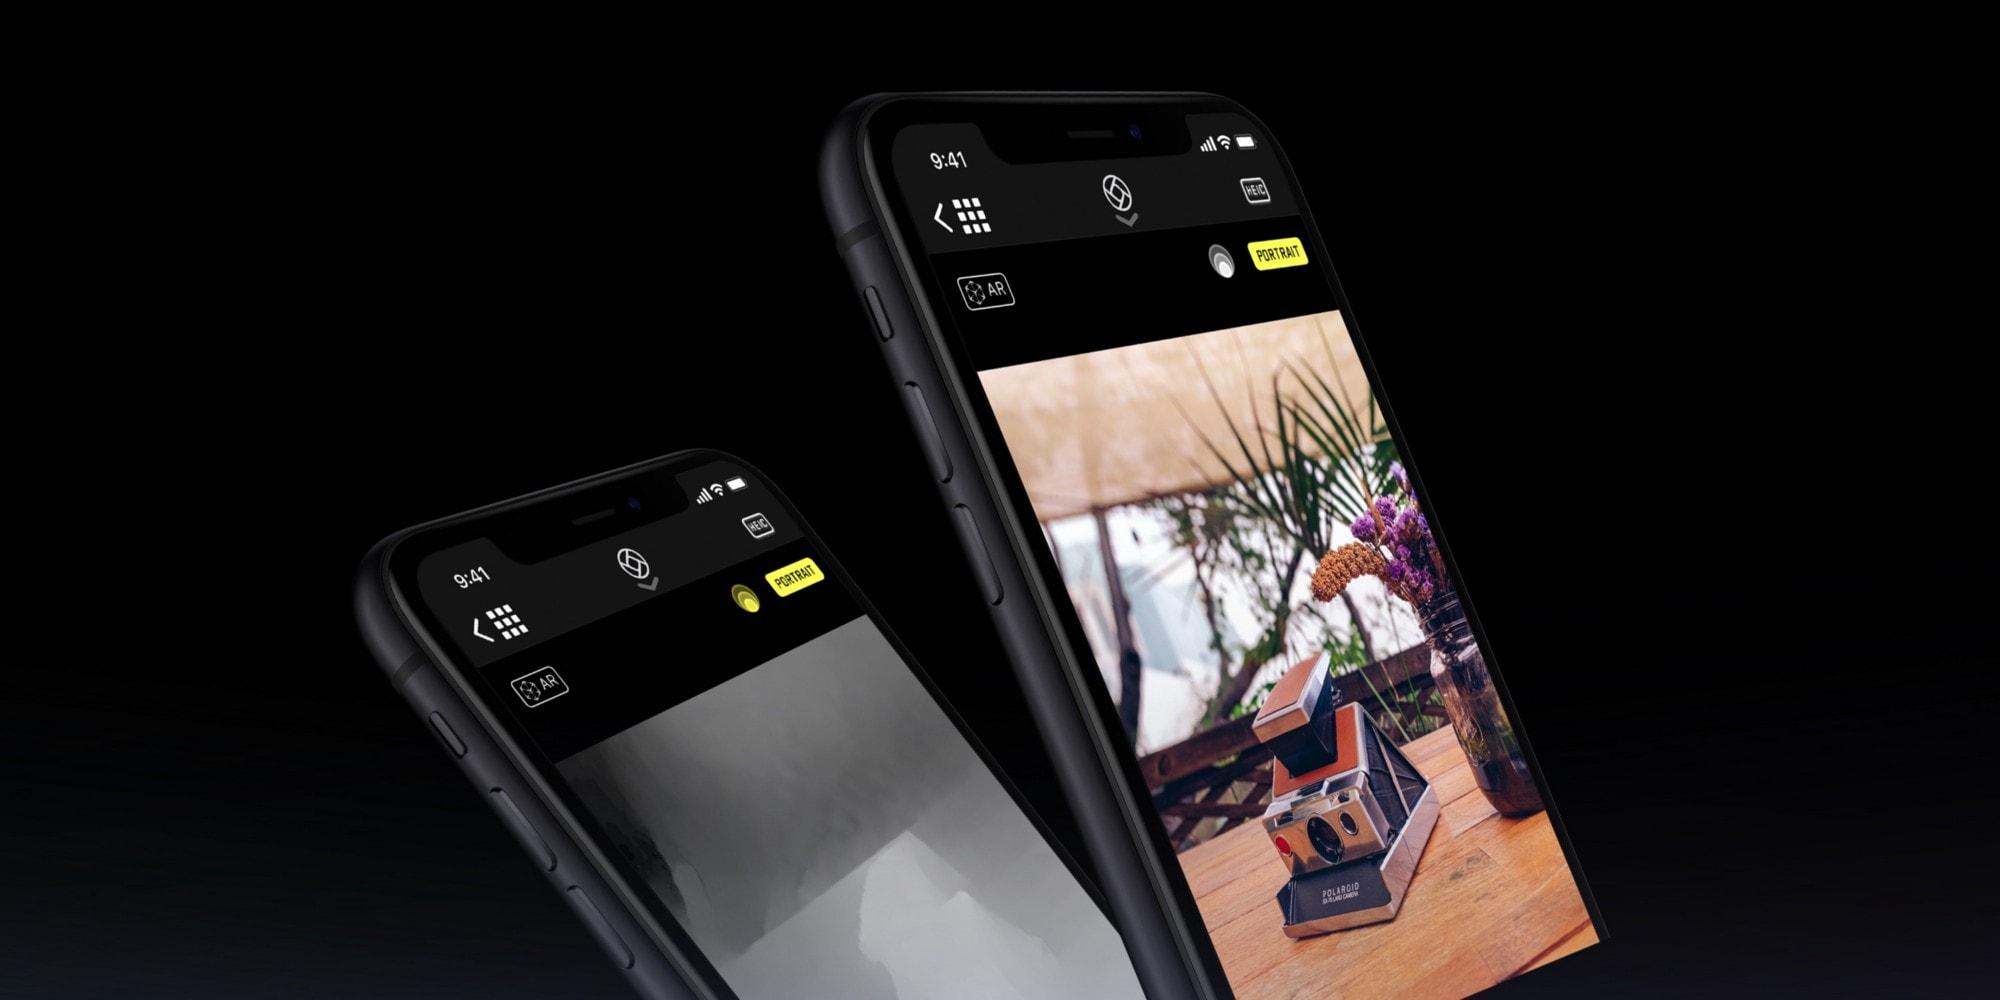 Halide iPhone xr portrait mode